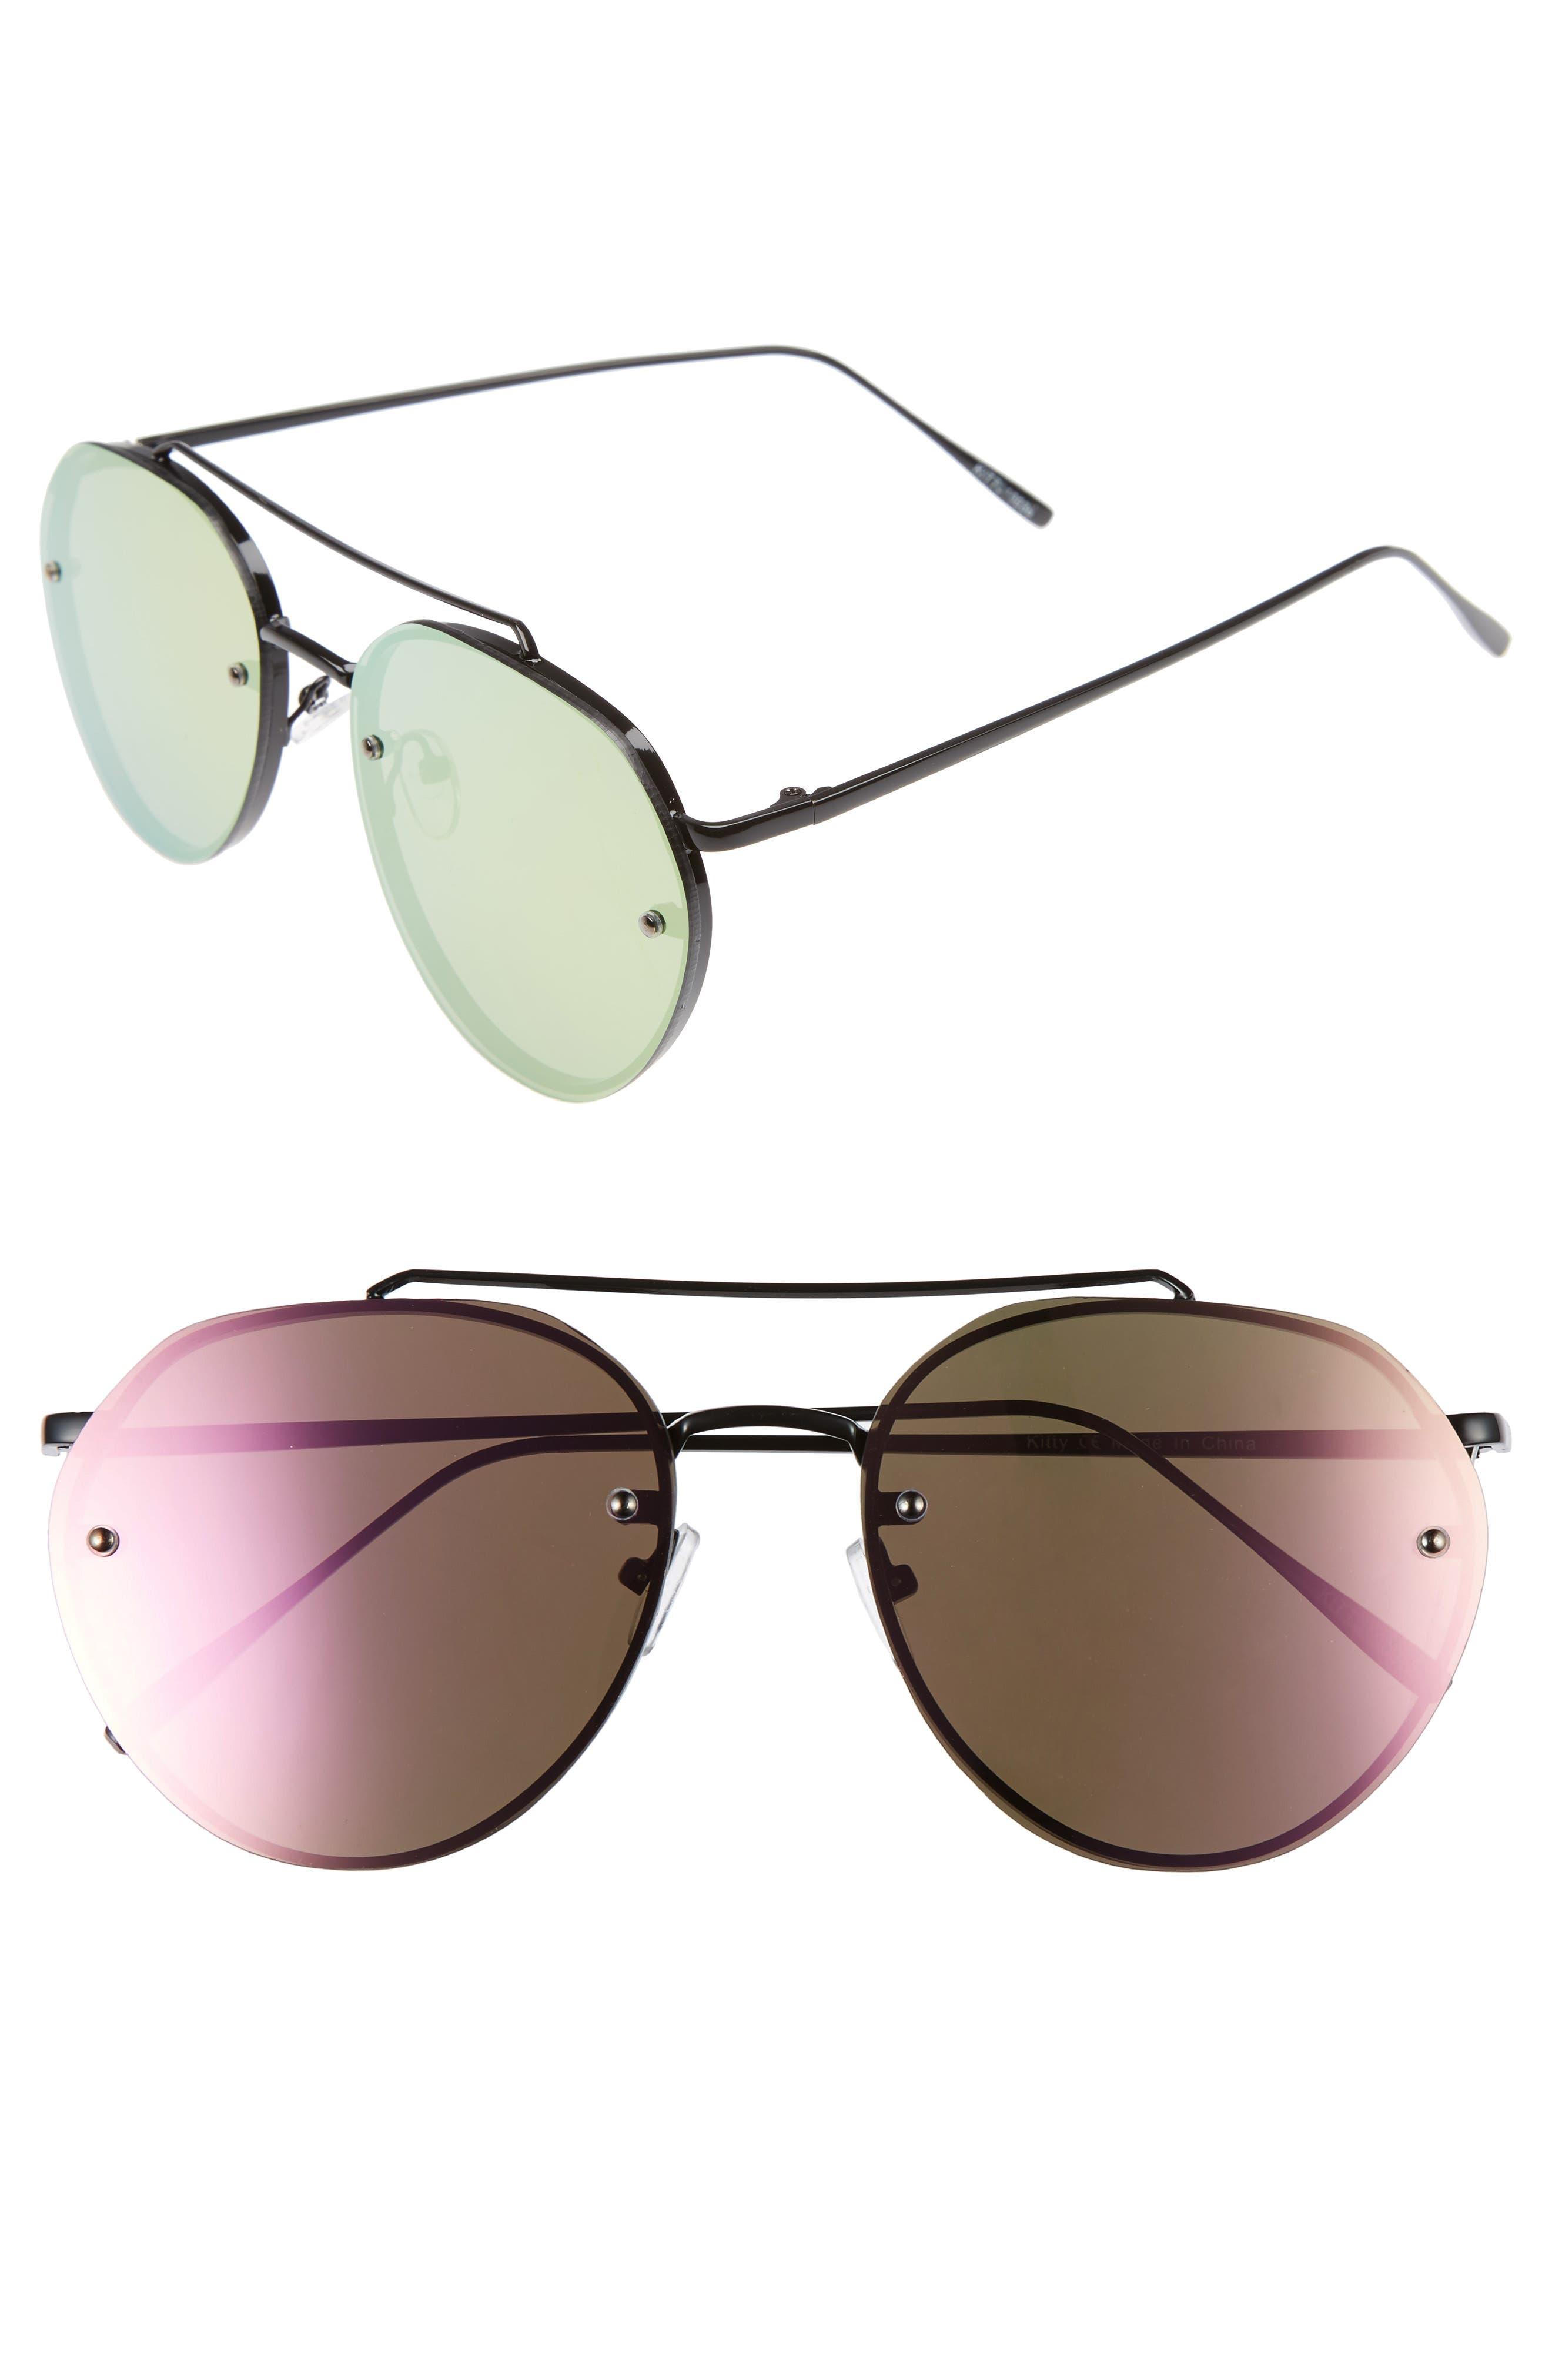 Main Image - Leith Kitty 60mm Mirrored Sunglasses